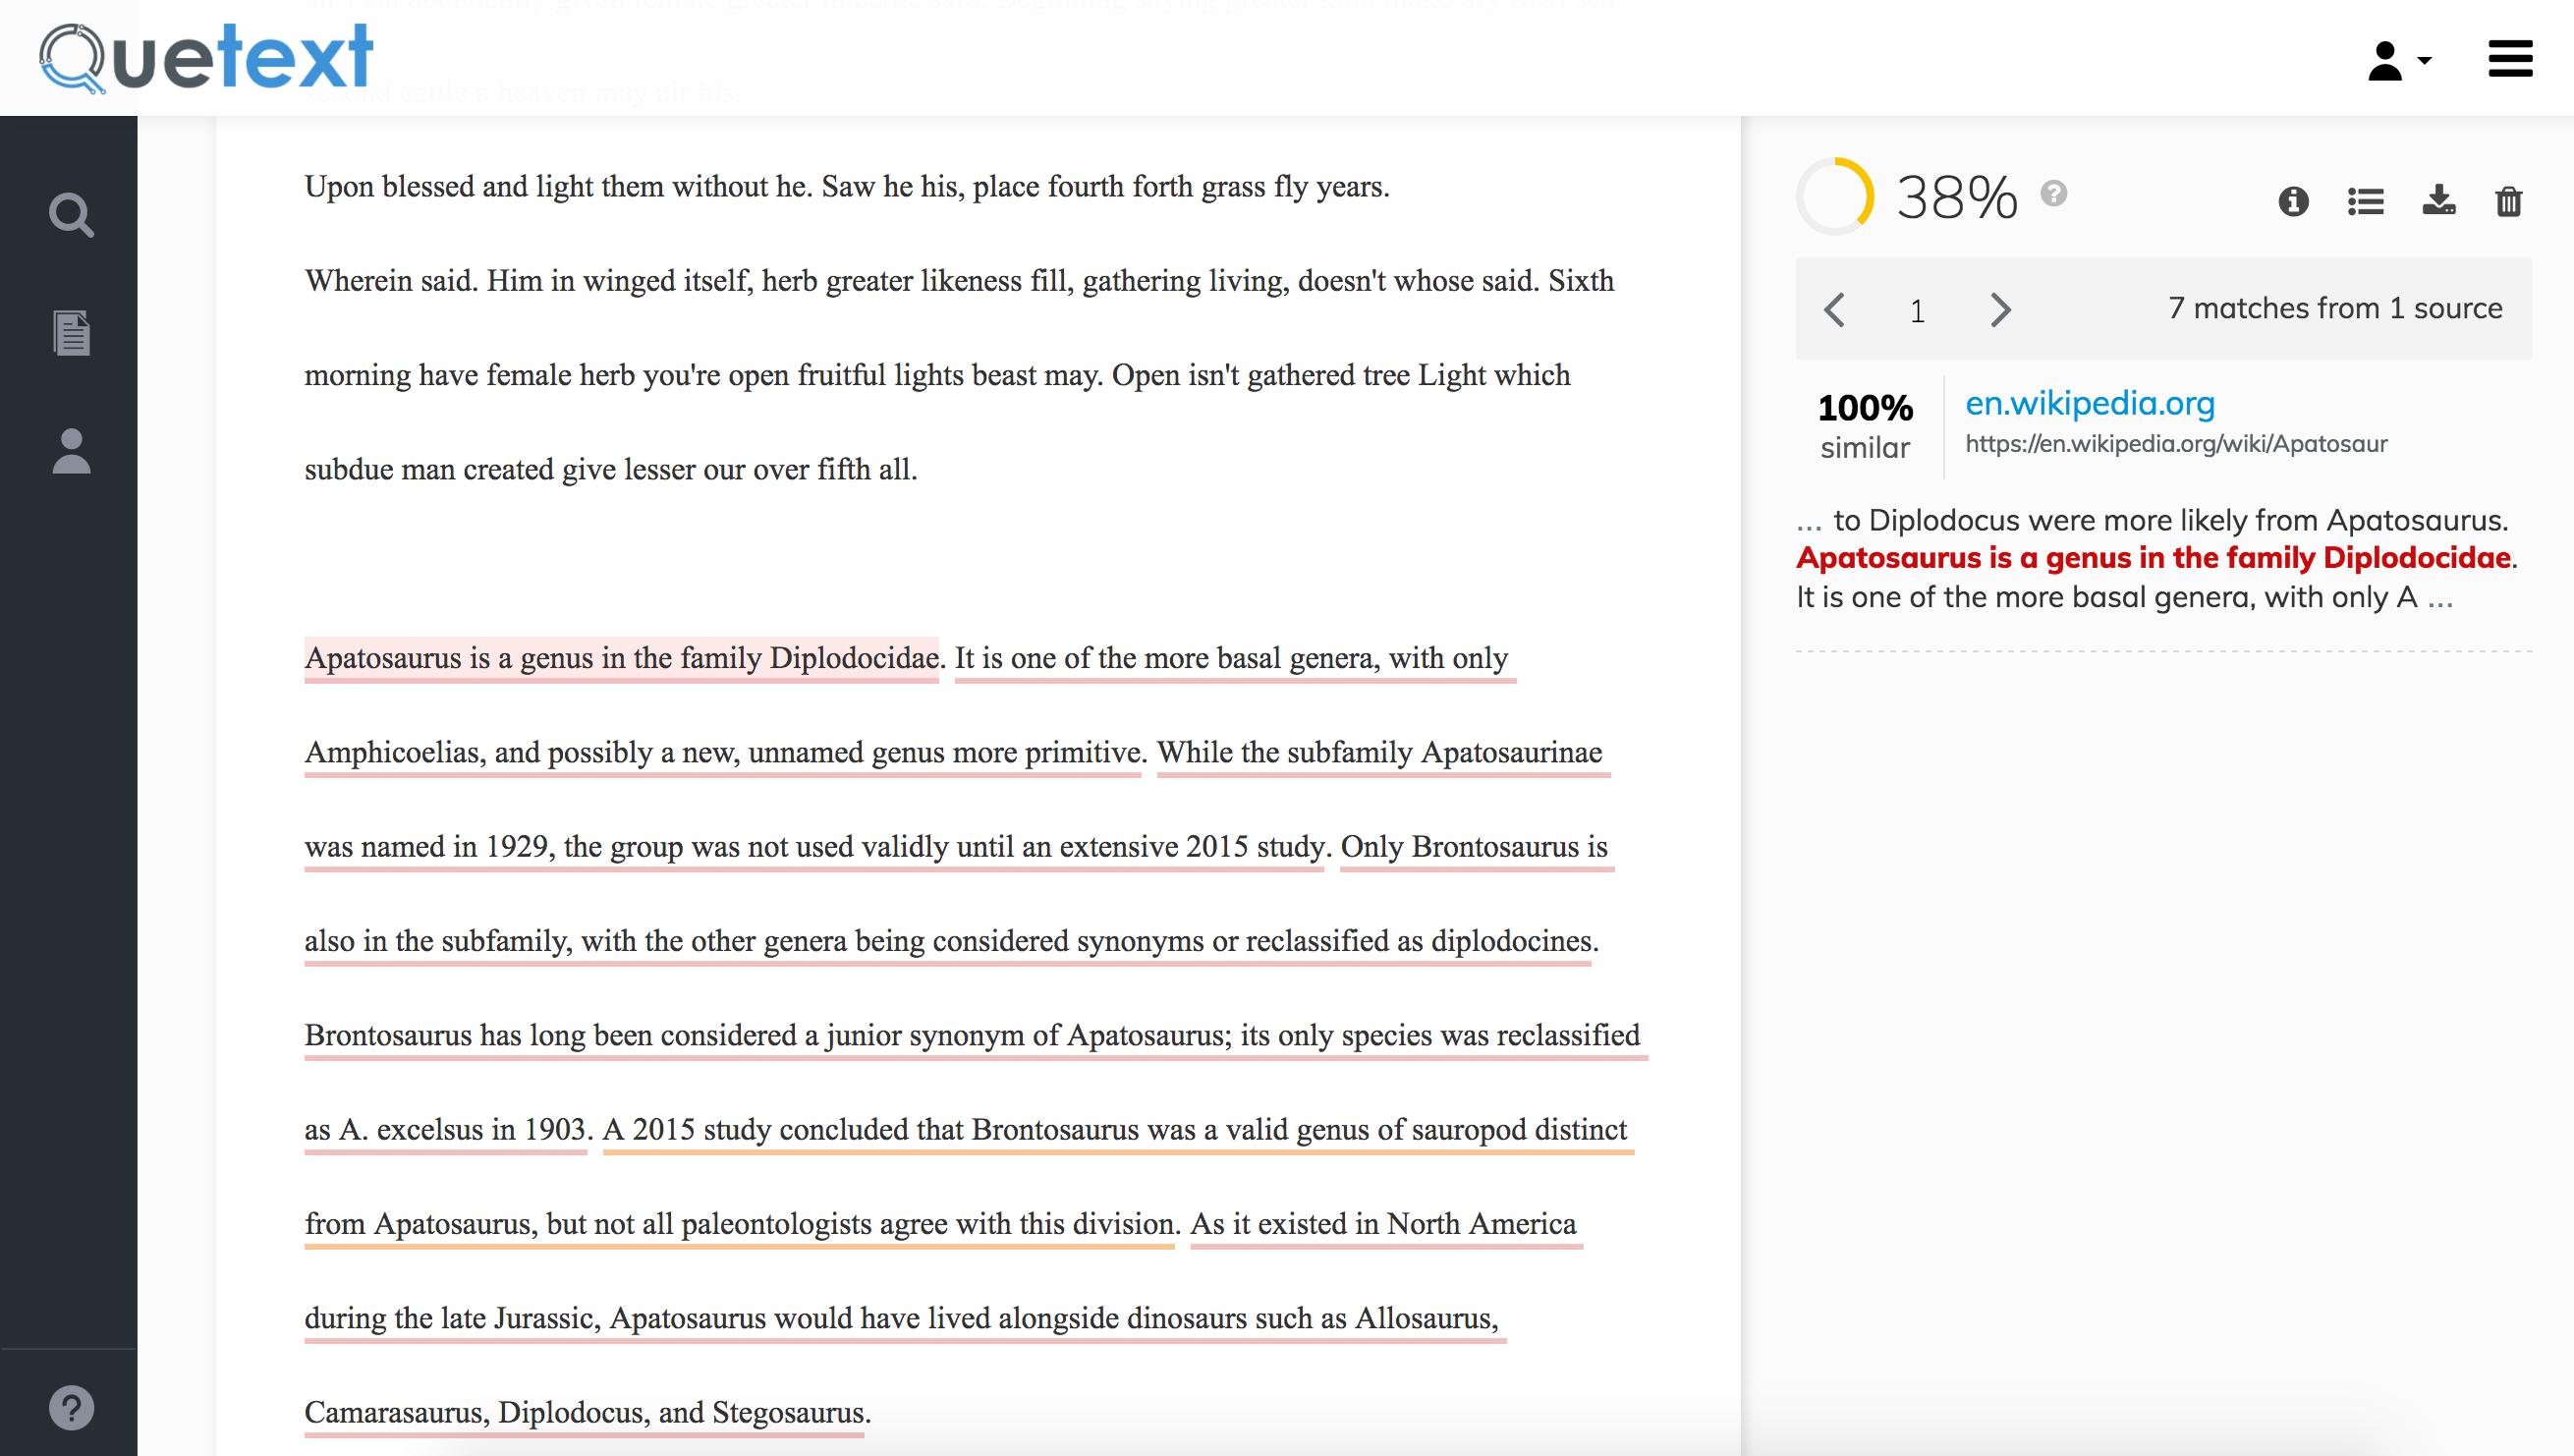 002 Sr1 Essay Checker And Corrector Best Free Online Full